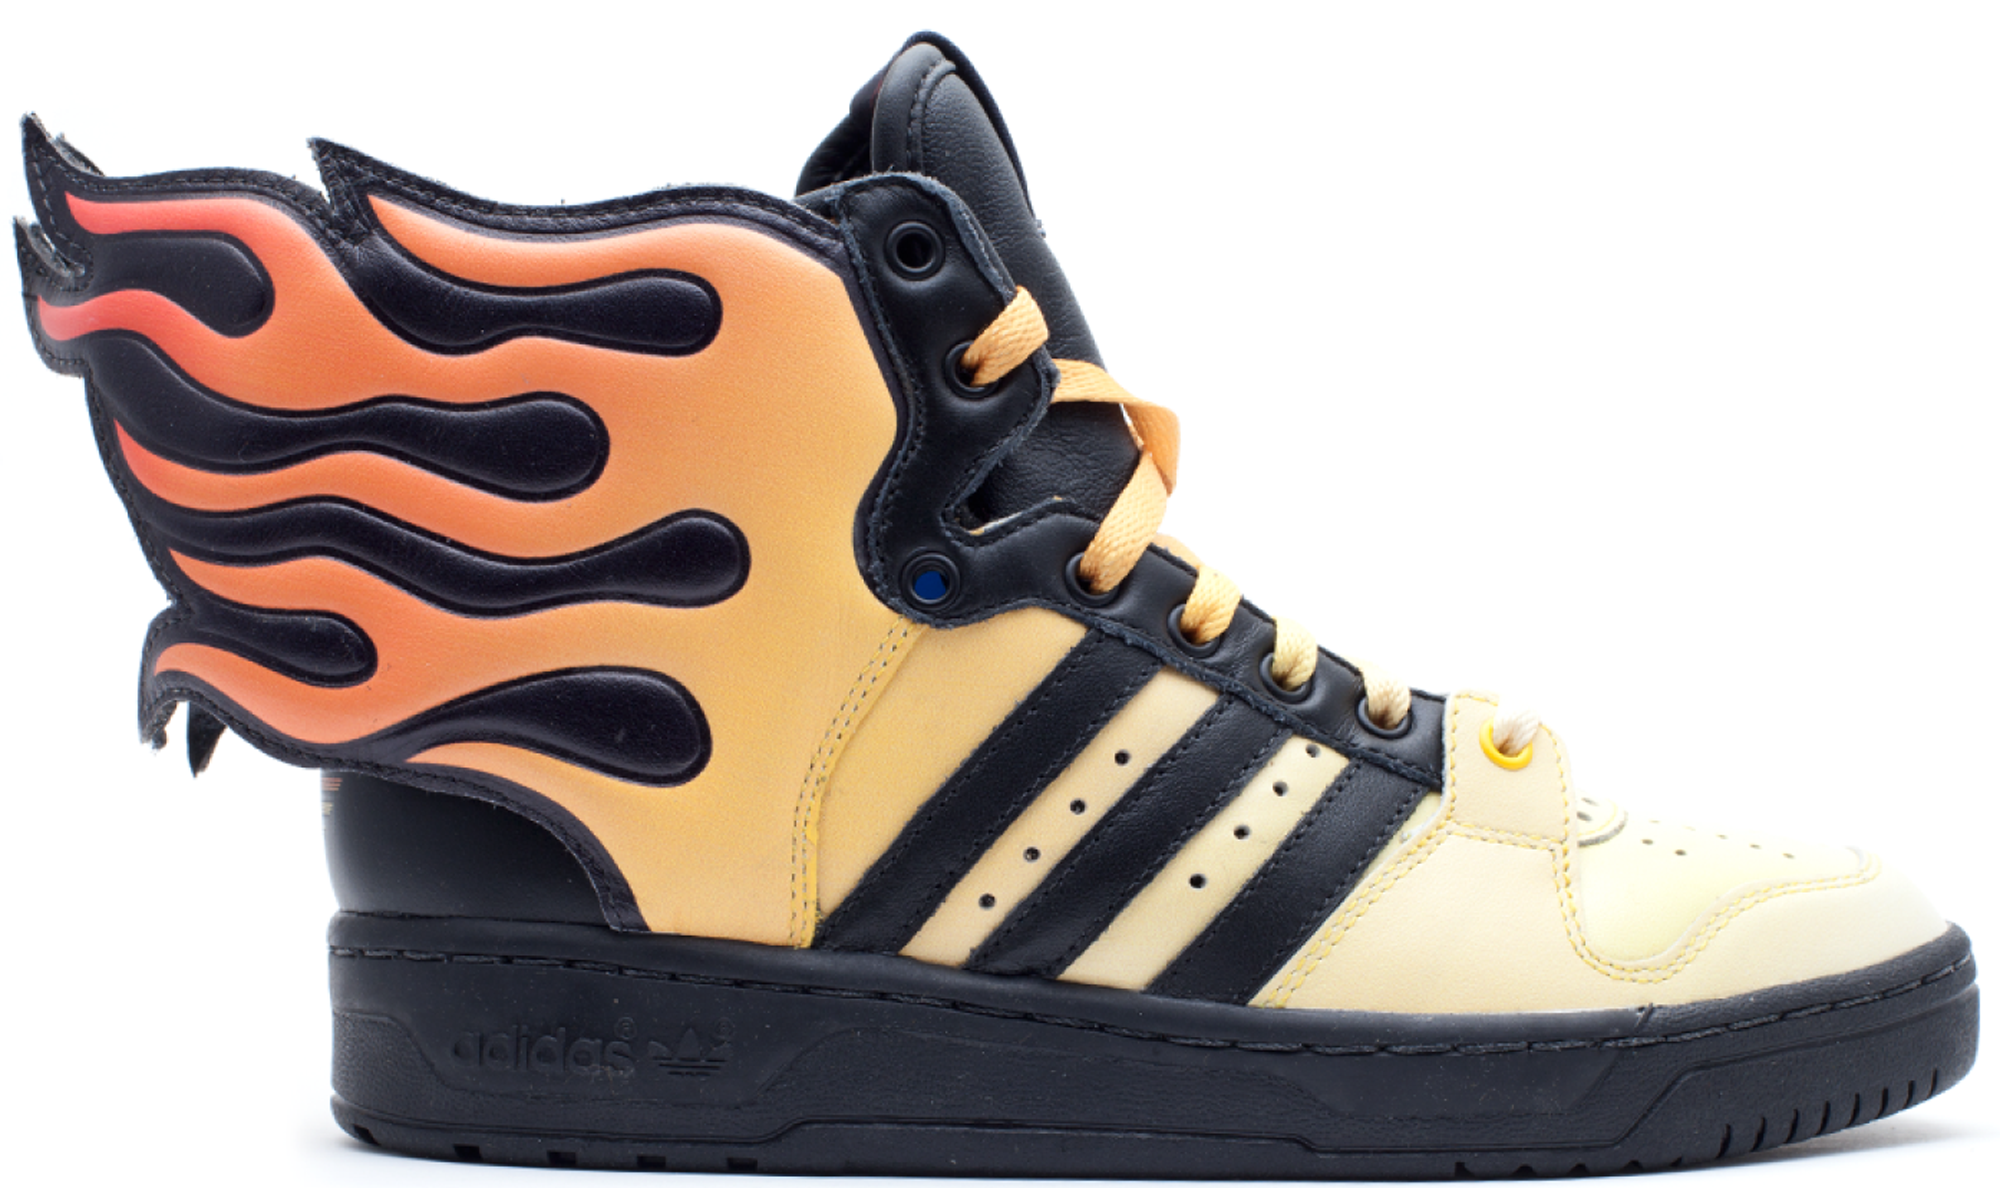 adidas JS Flames Jeremy Scott - G43713